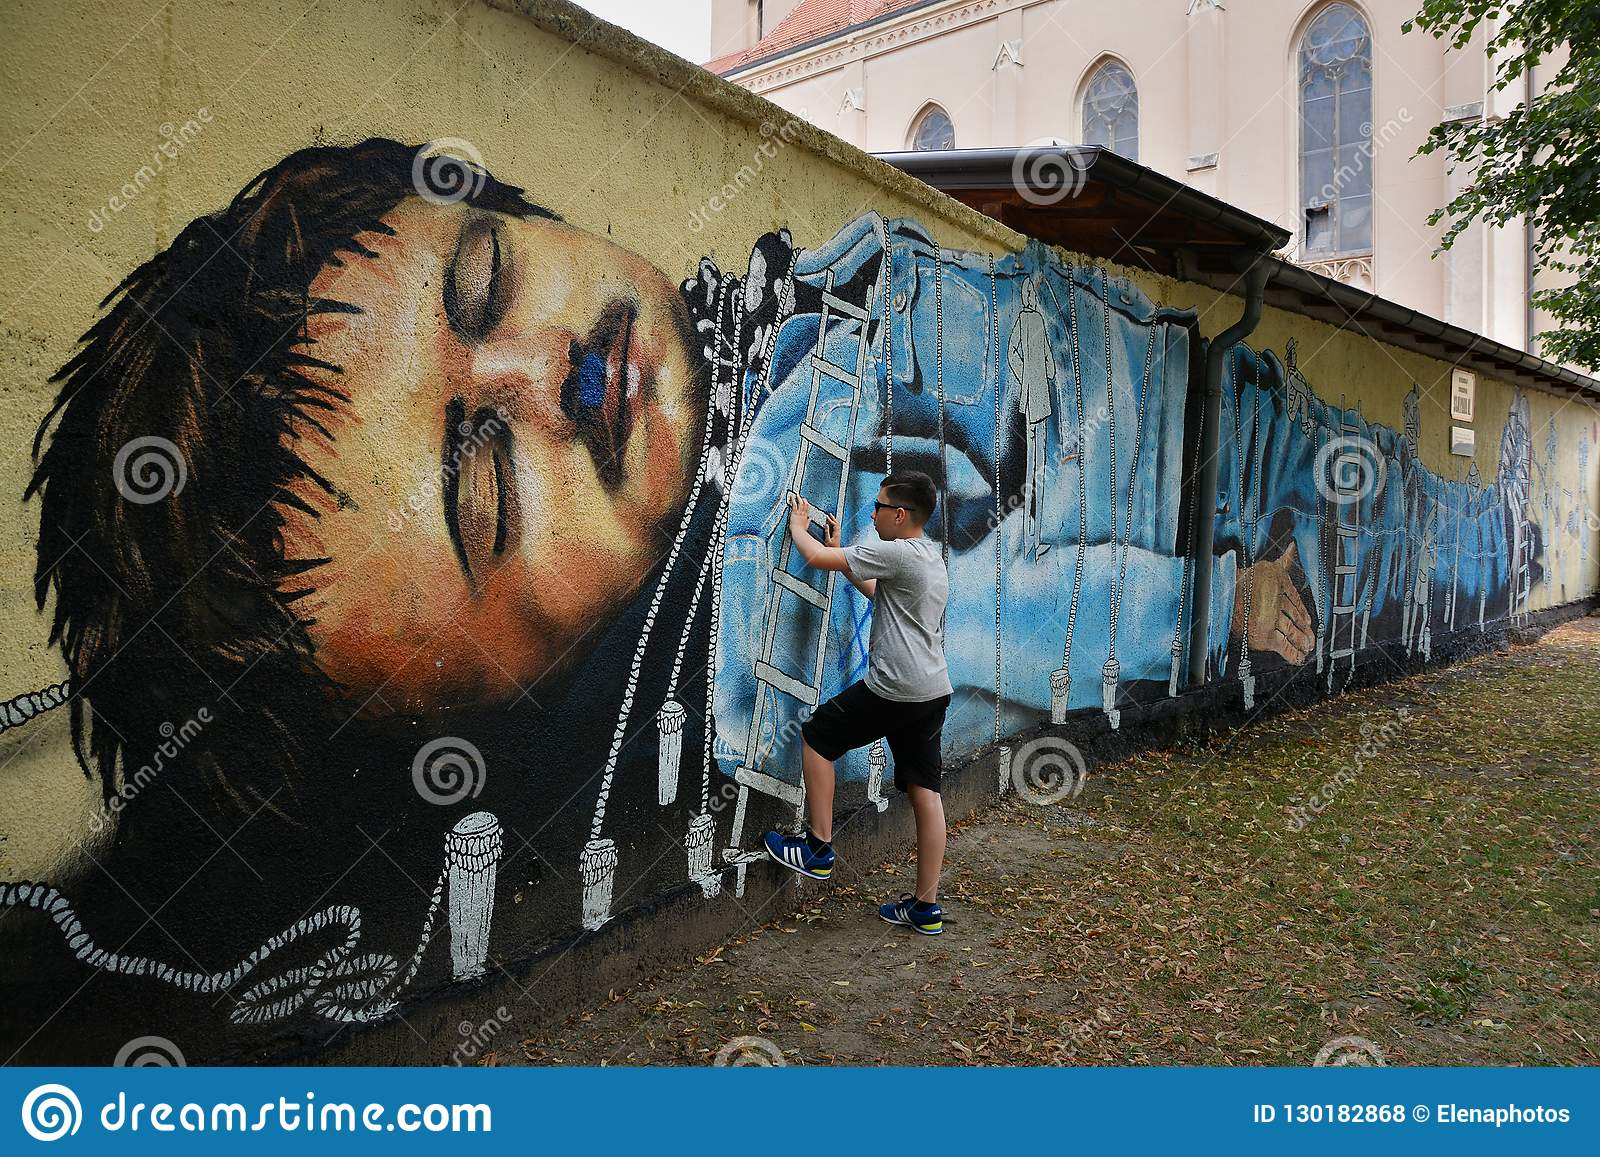 boris graffiti 6.1 download